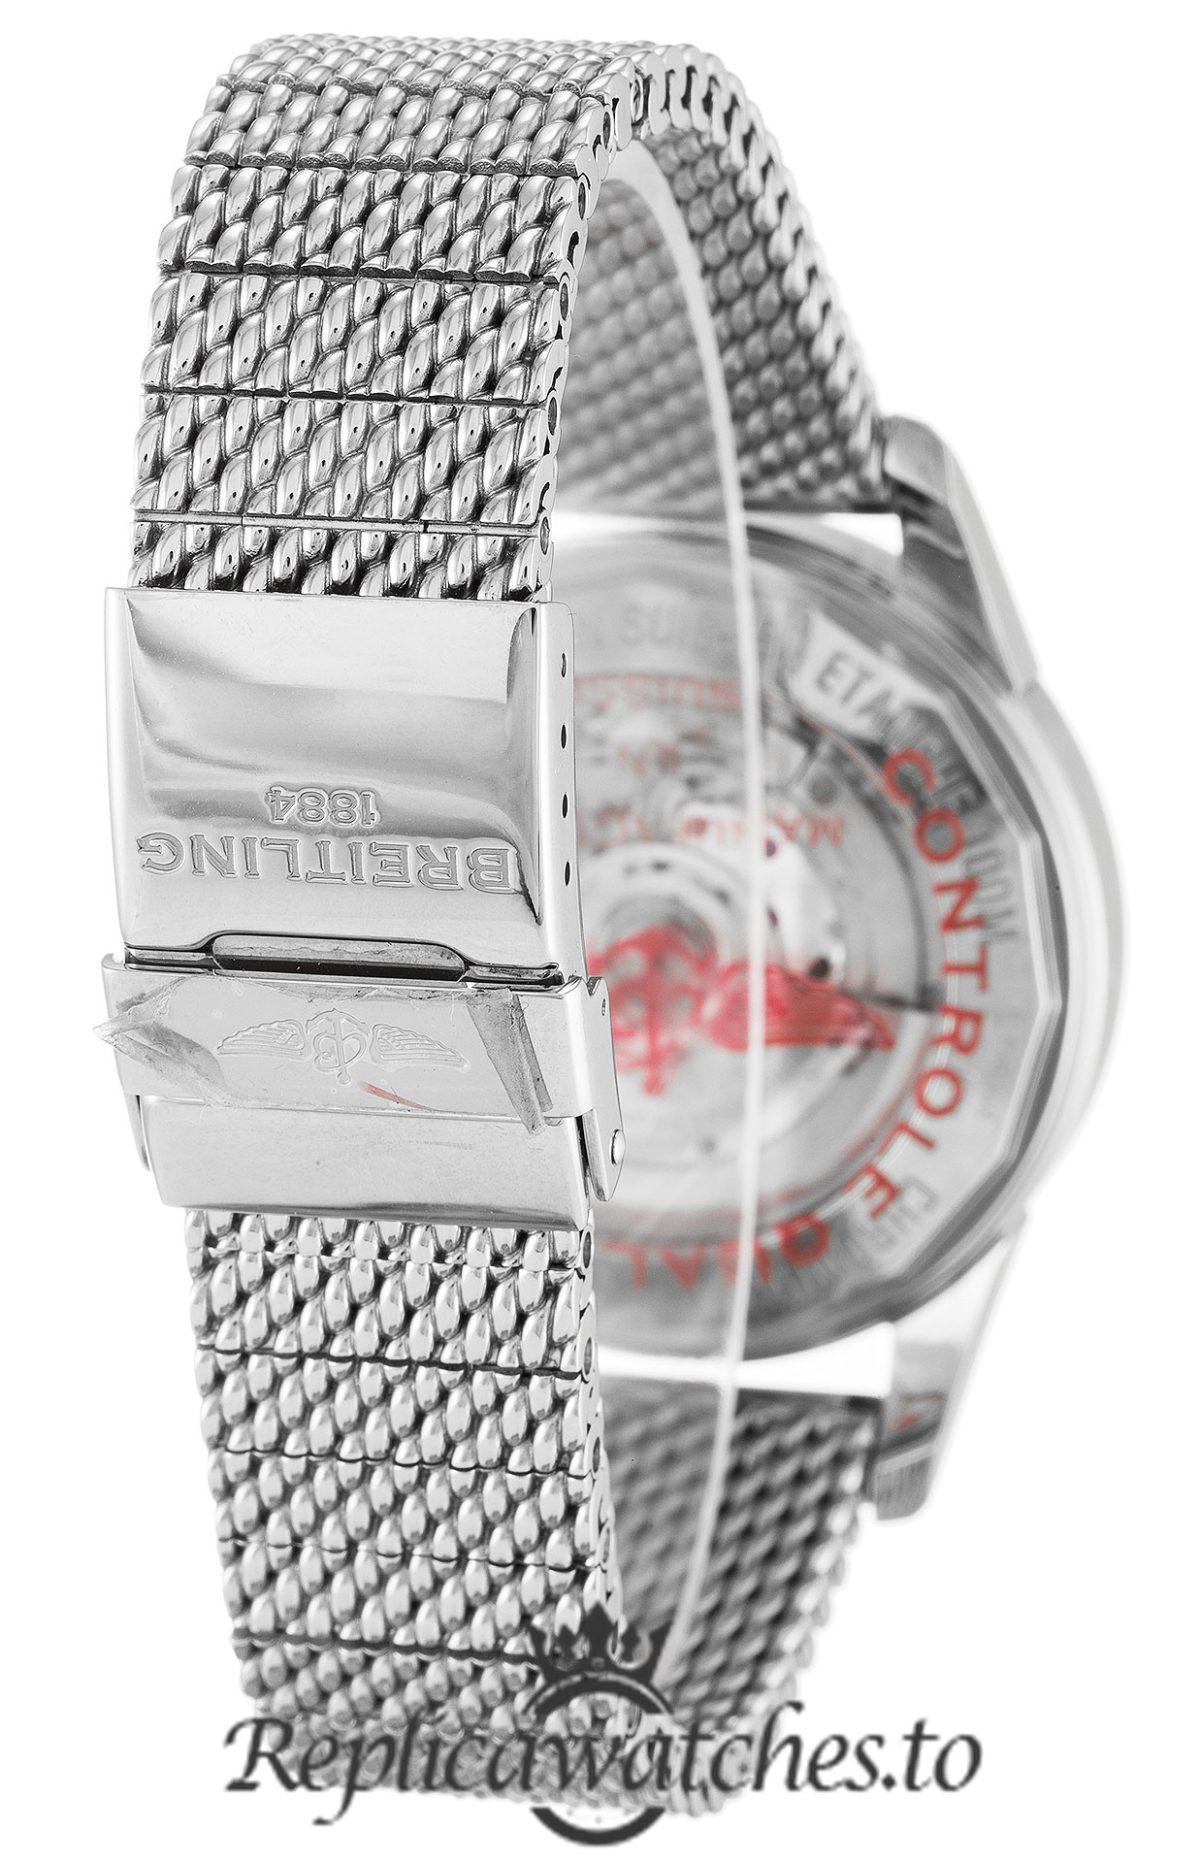 Breitling Transocean Chronograph Replica AB0152 001 Black Dial 43MM